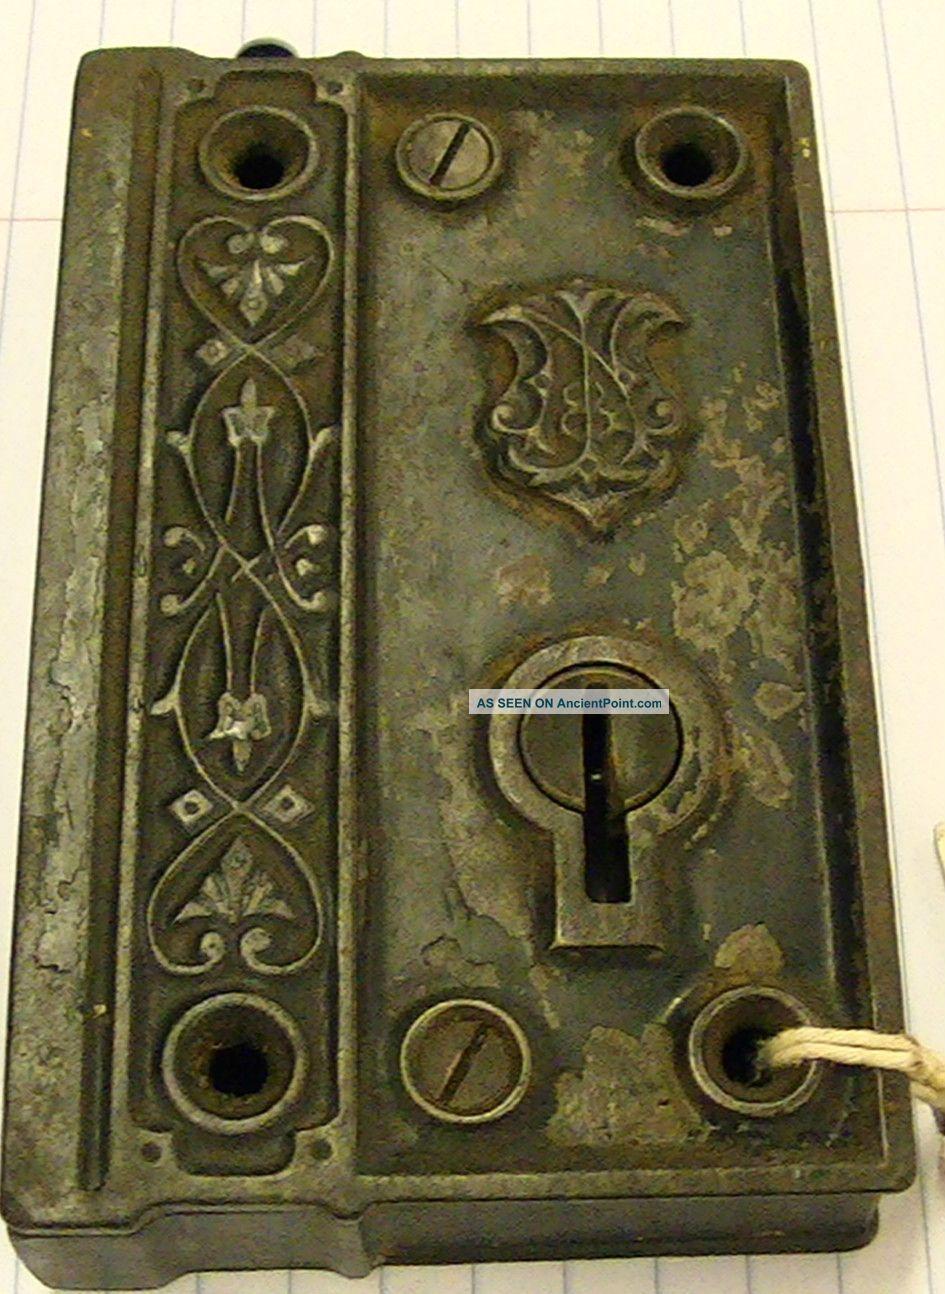 How a skeleton key lock works